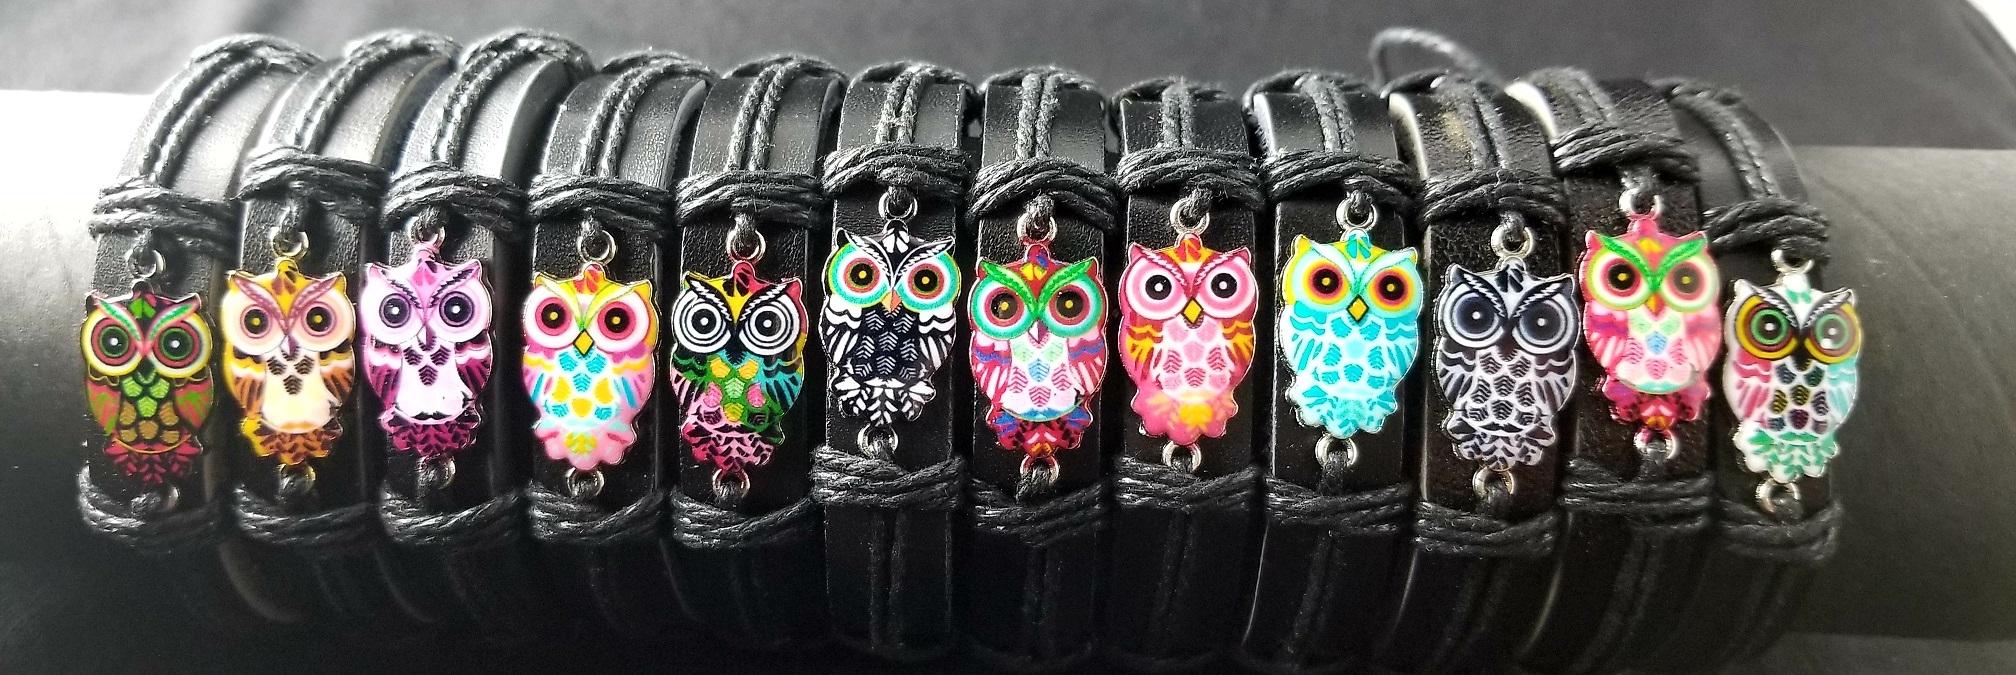 Fashion - Jewelry - Owl Leather Band BRACELETs YBT-2786 (SOLD BY THE DOZEN)